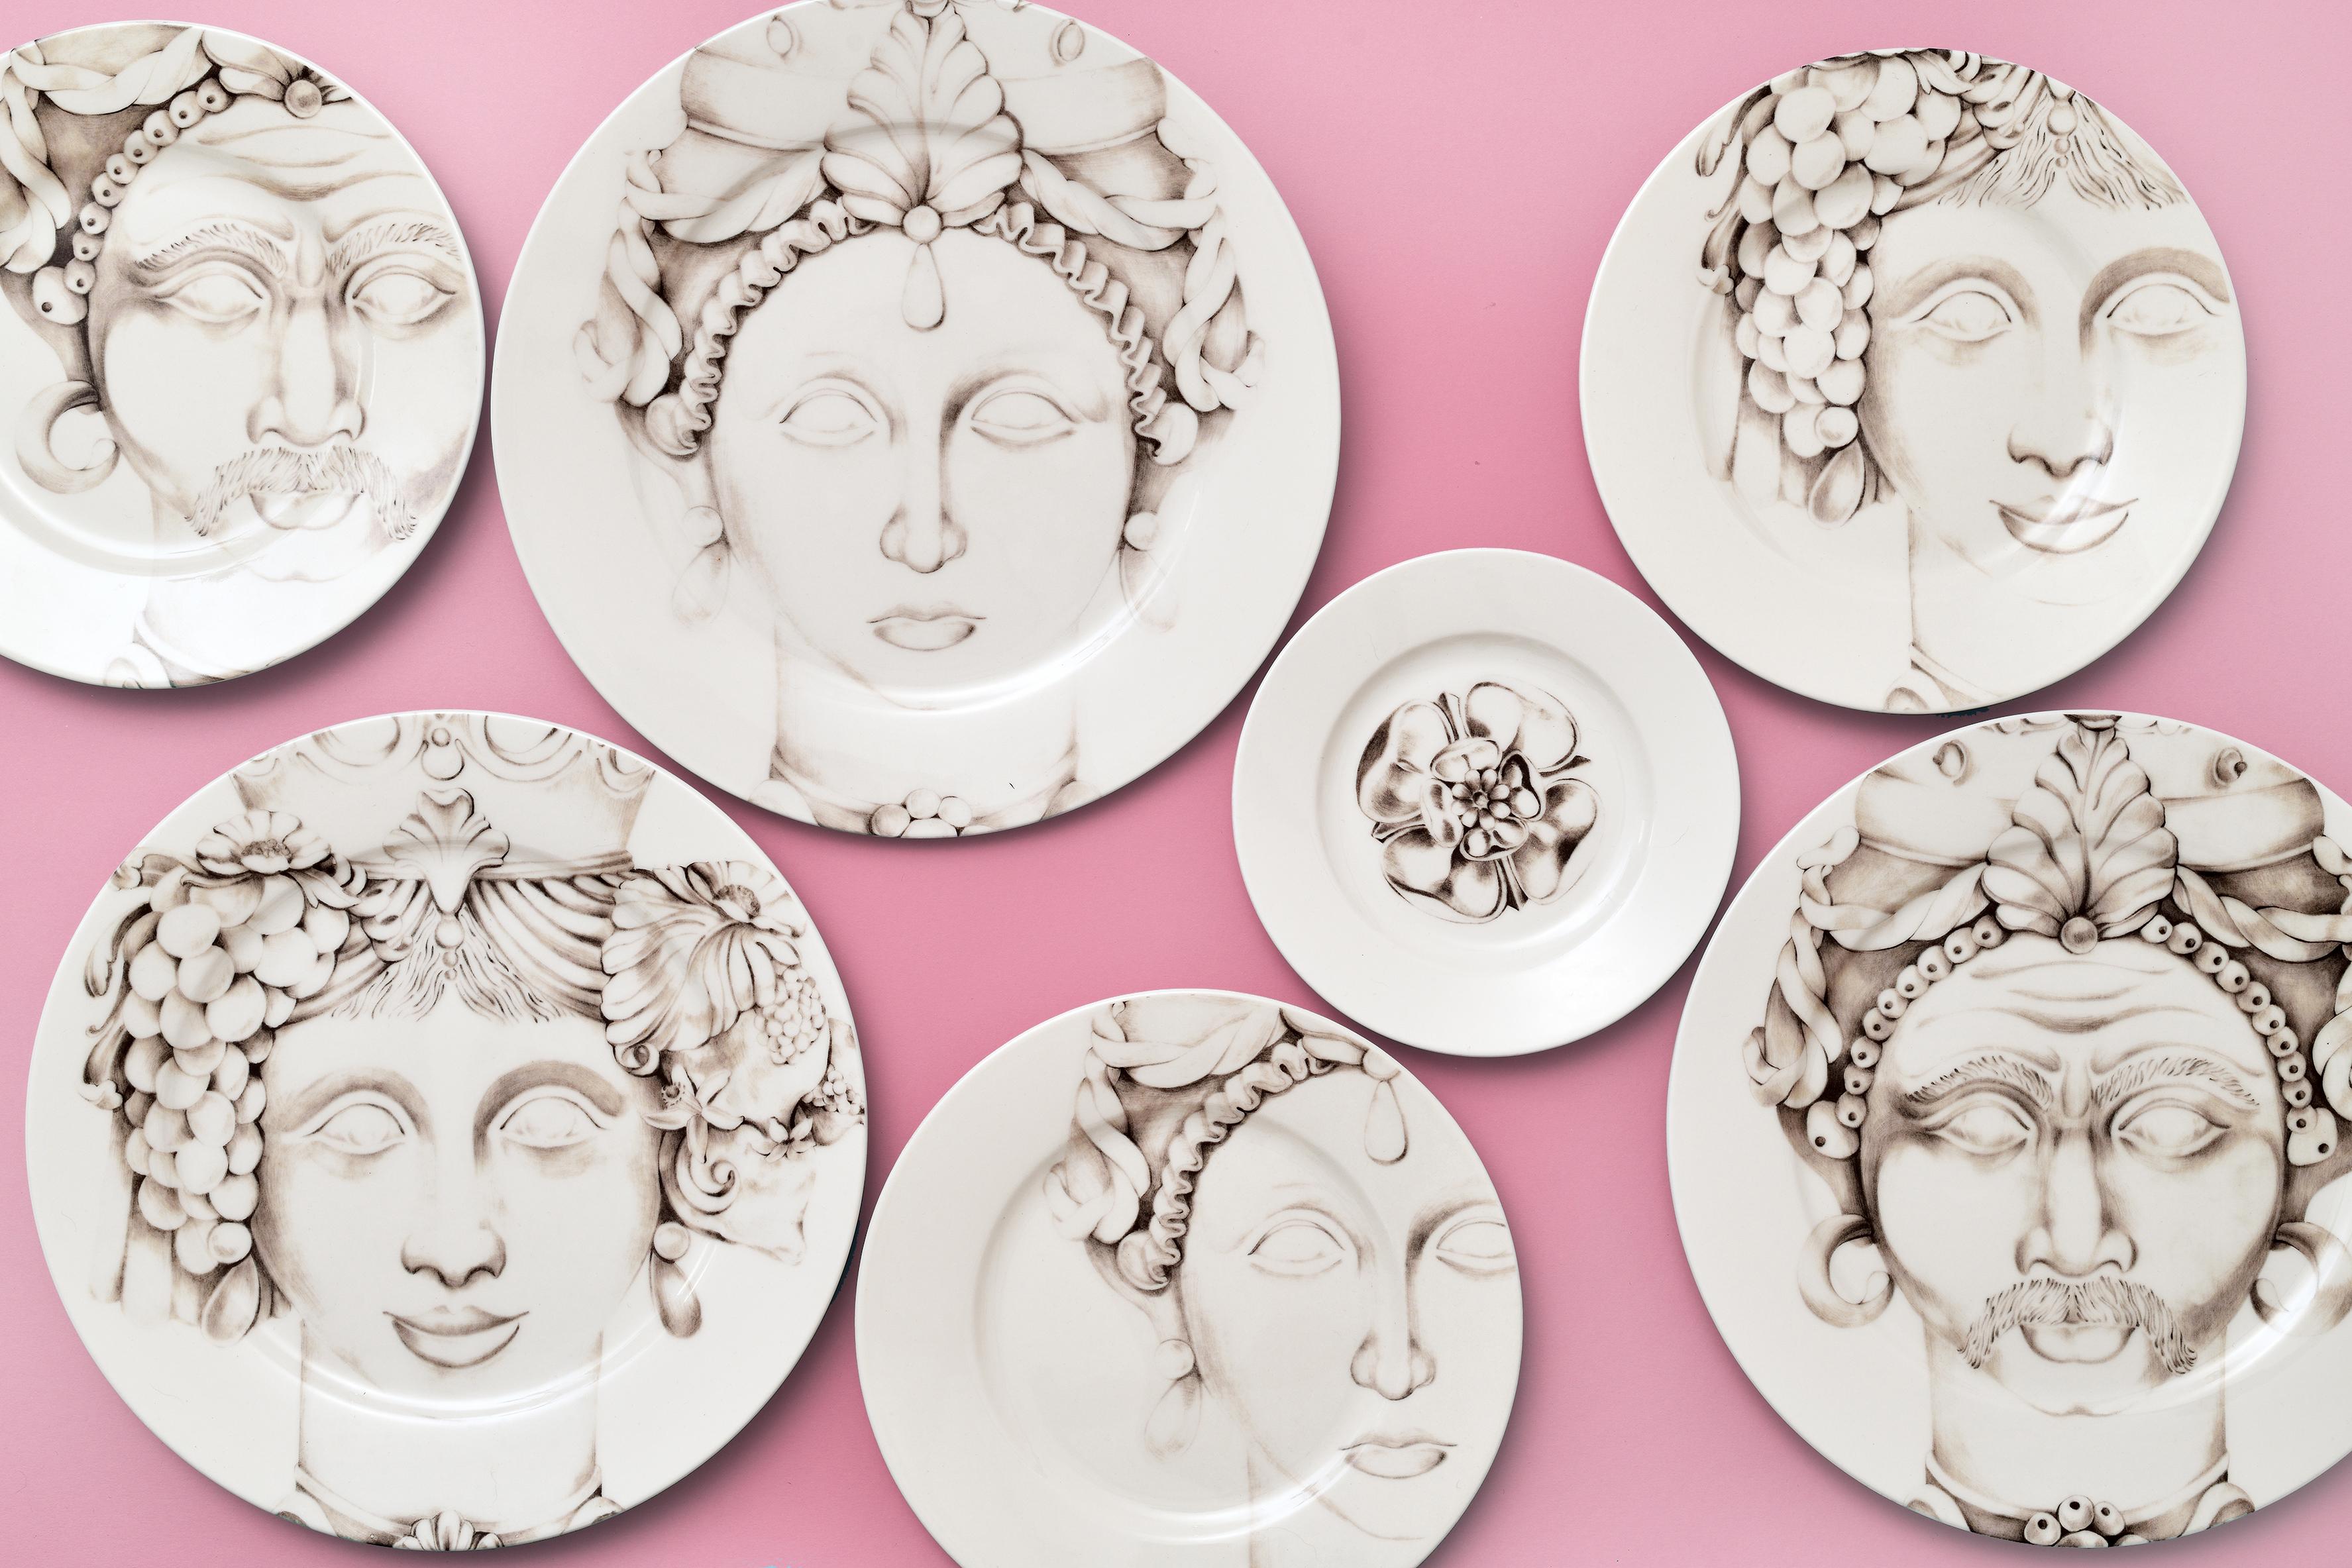 Francesca Colombo - teste di moro - porcelain hand painted - print - made in italy - sicily - tradicional grey - Alejandro Catalina - Rosalina - plates - new classic style - wallpapers